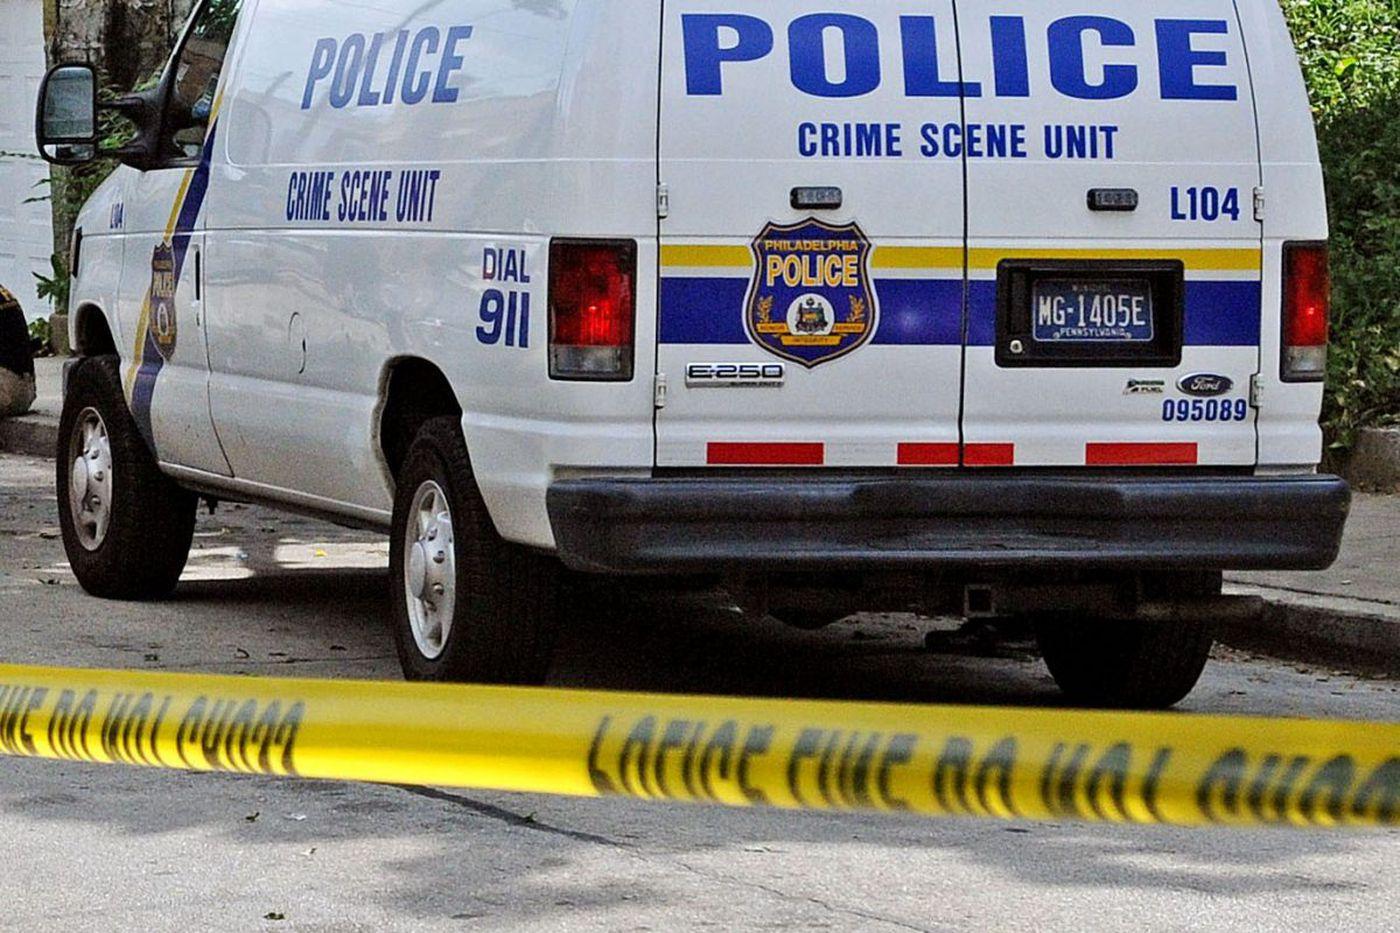 4 slain in 24 hours in Philly